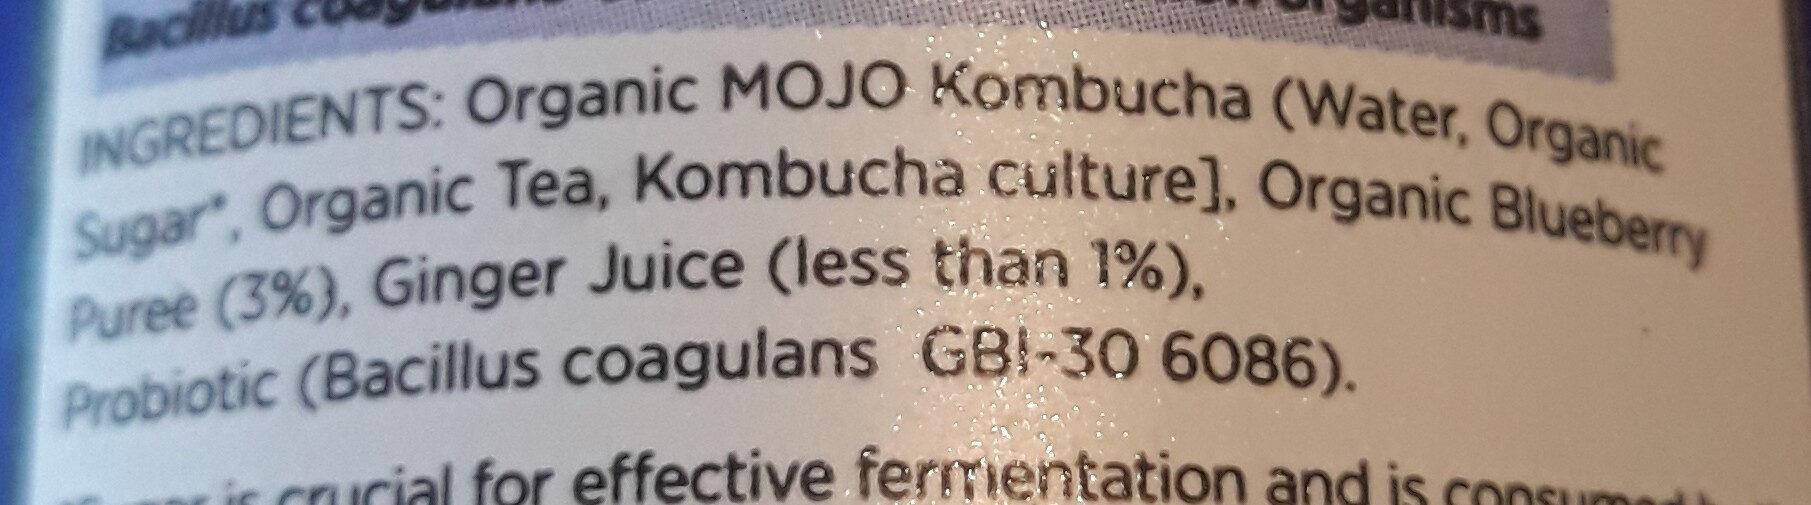 Kombucha Blueberry and Ginger - Ingredients - en